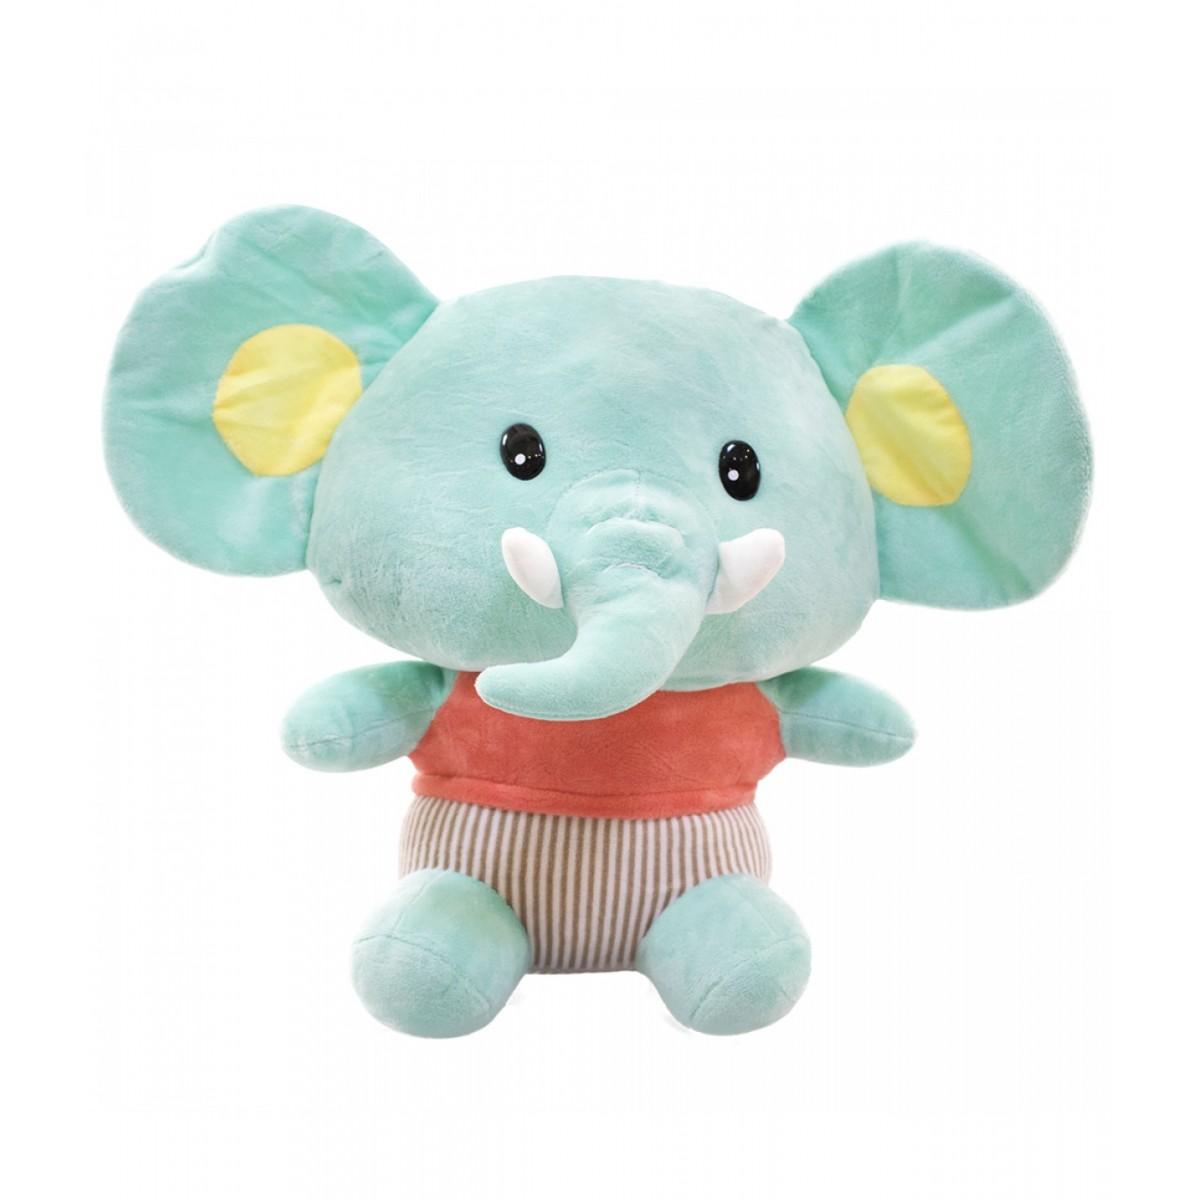 Pelúcia de Elefante Bebê Verde 30cm Poliéster